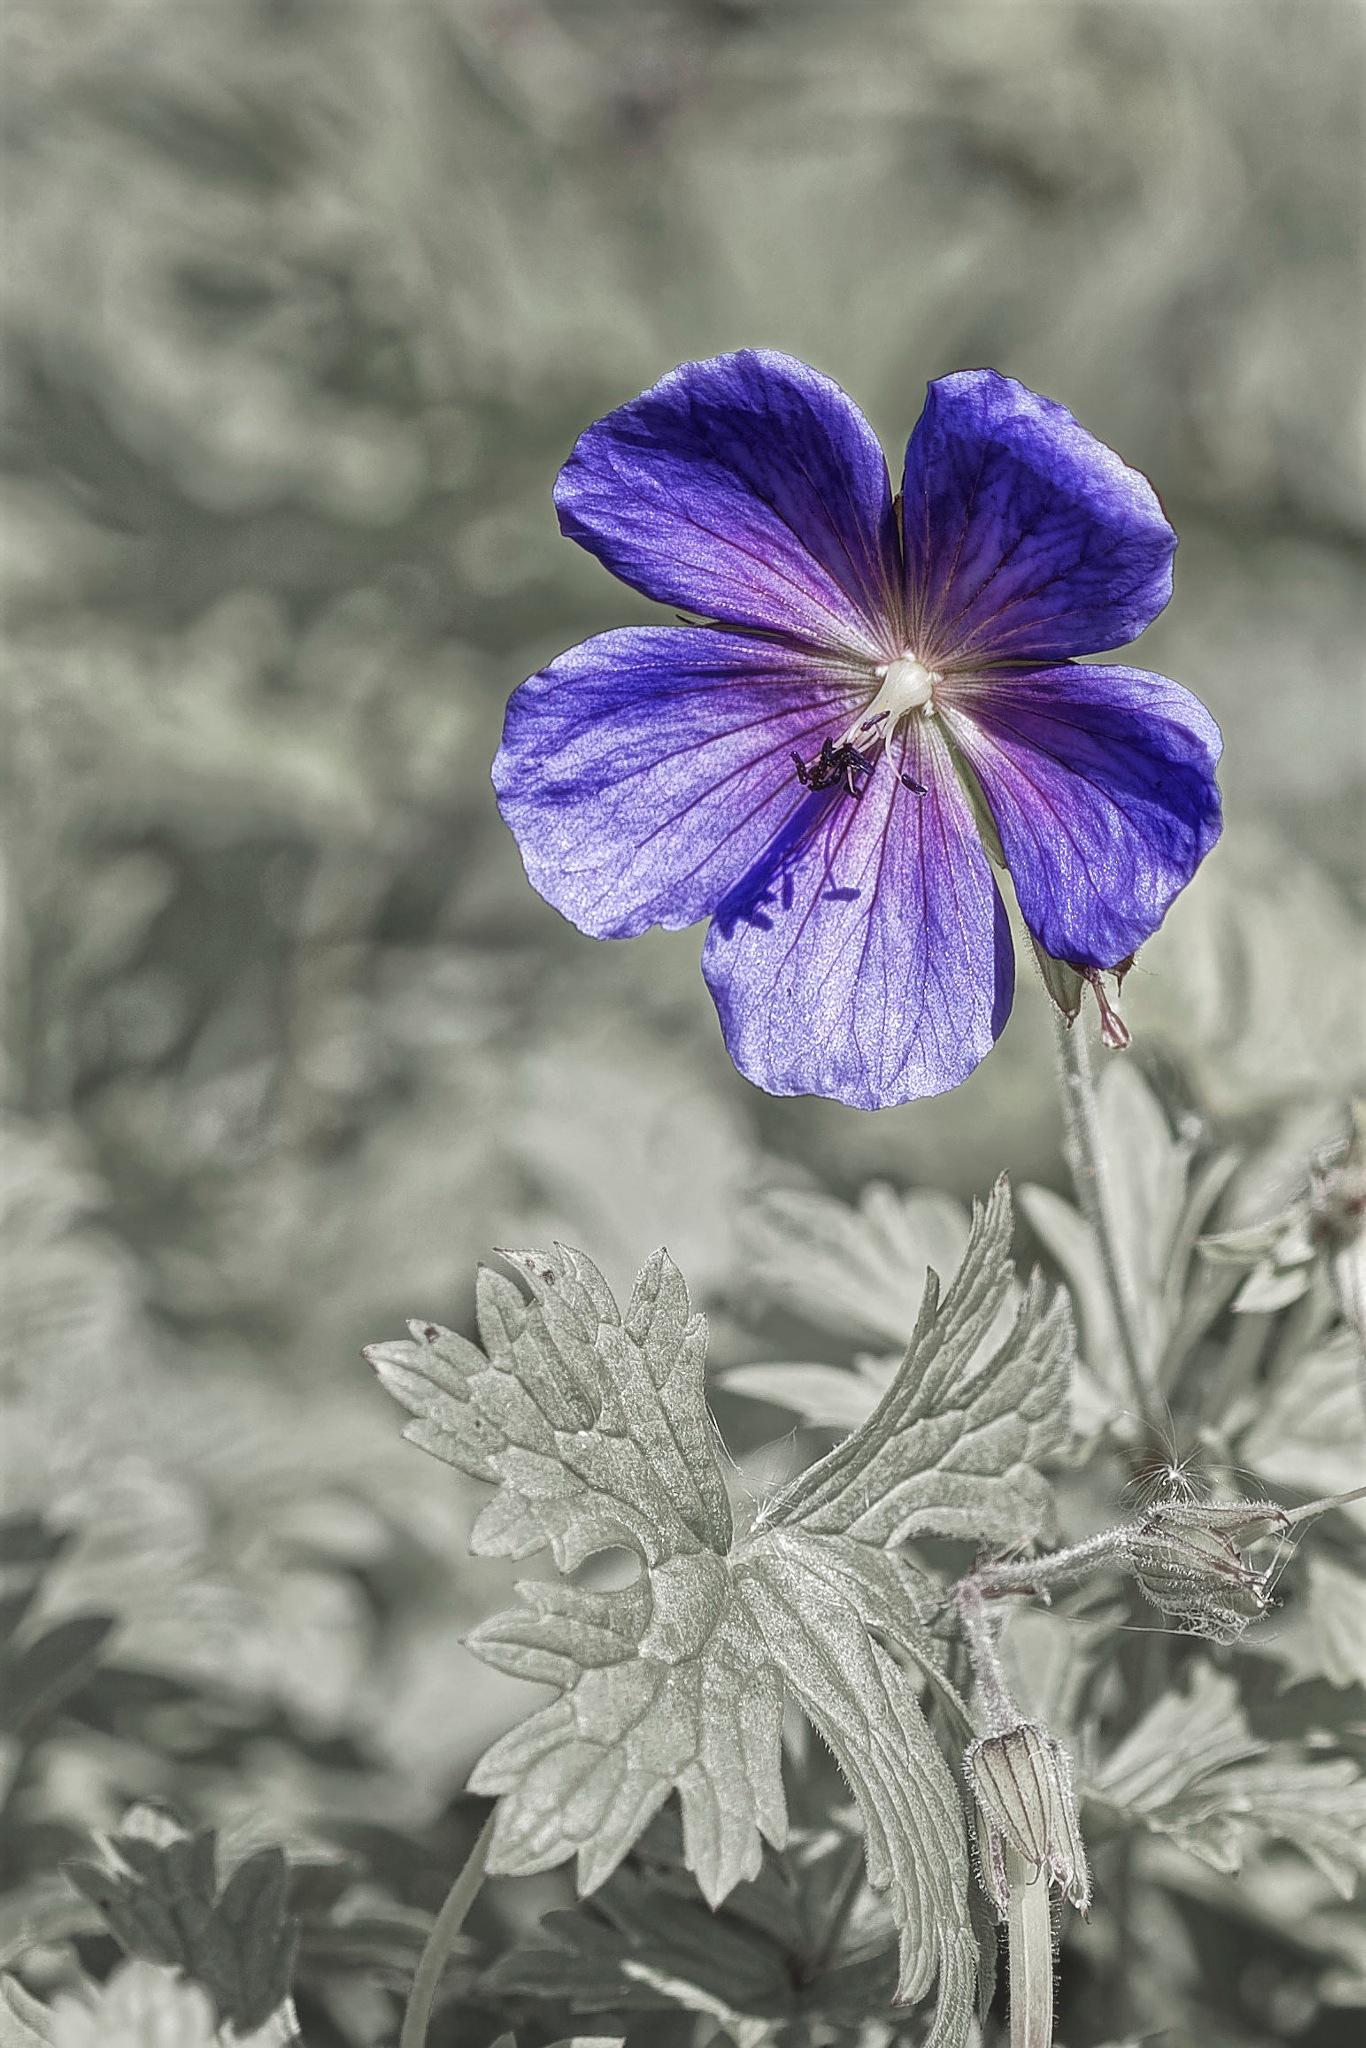 Violet Flower by Stephen Drew